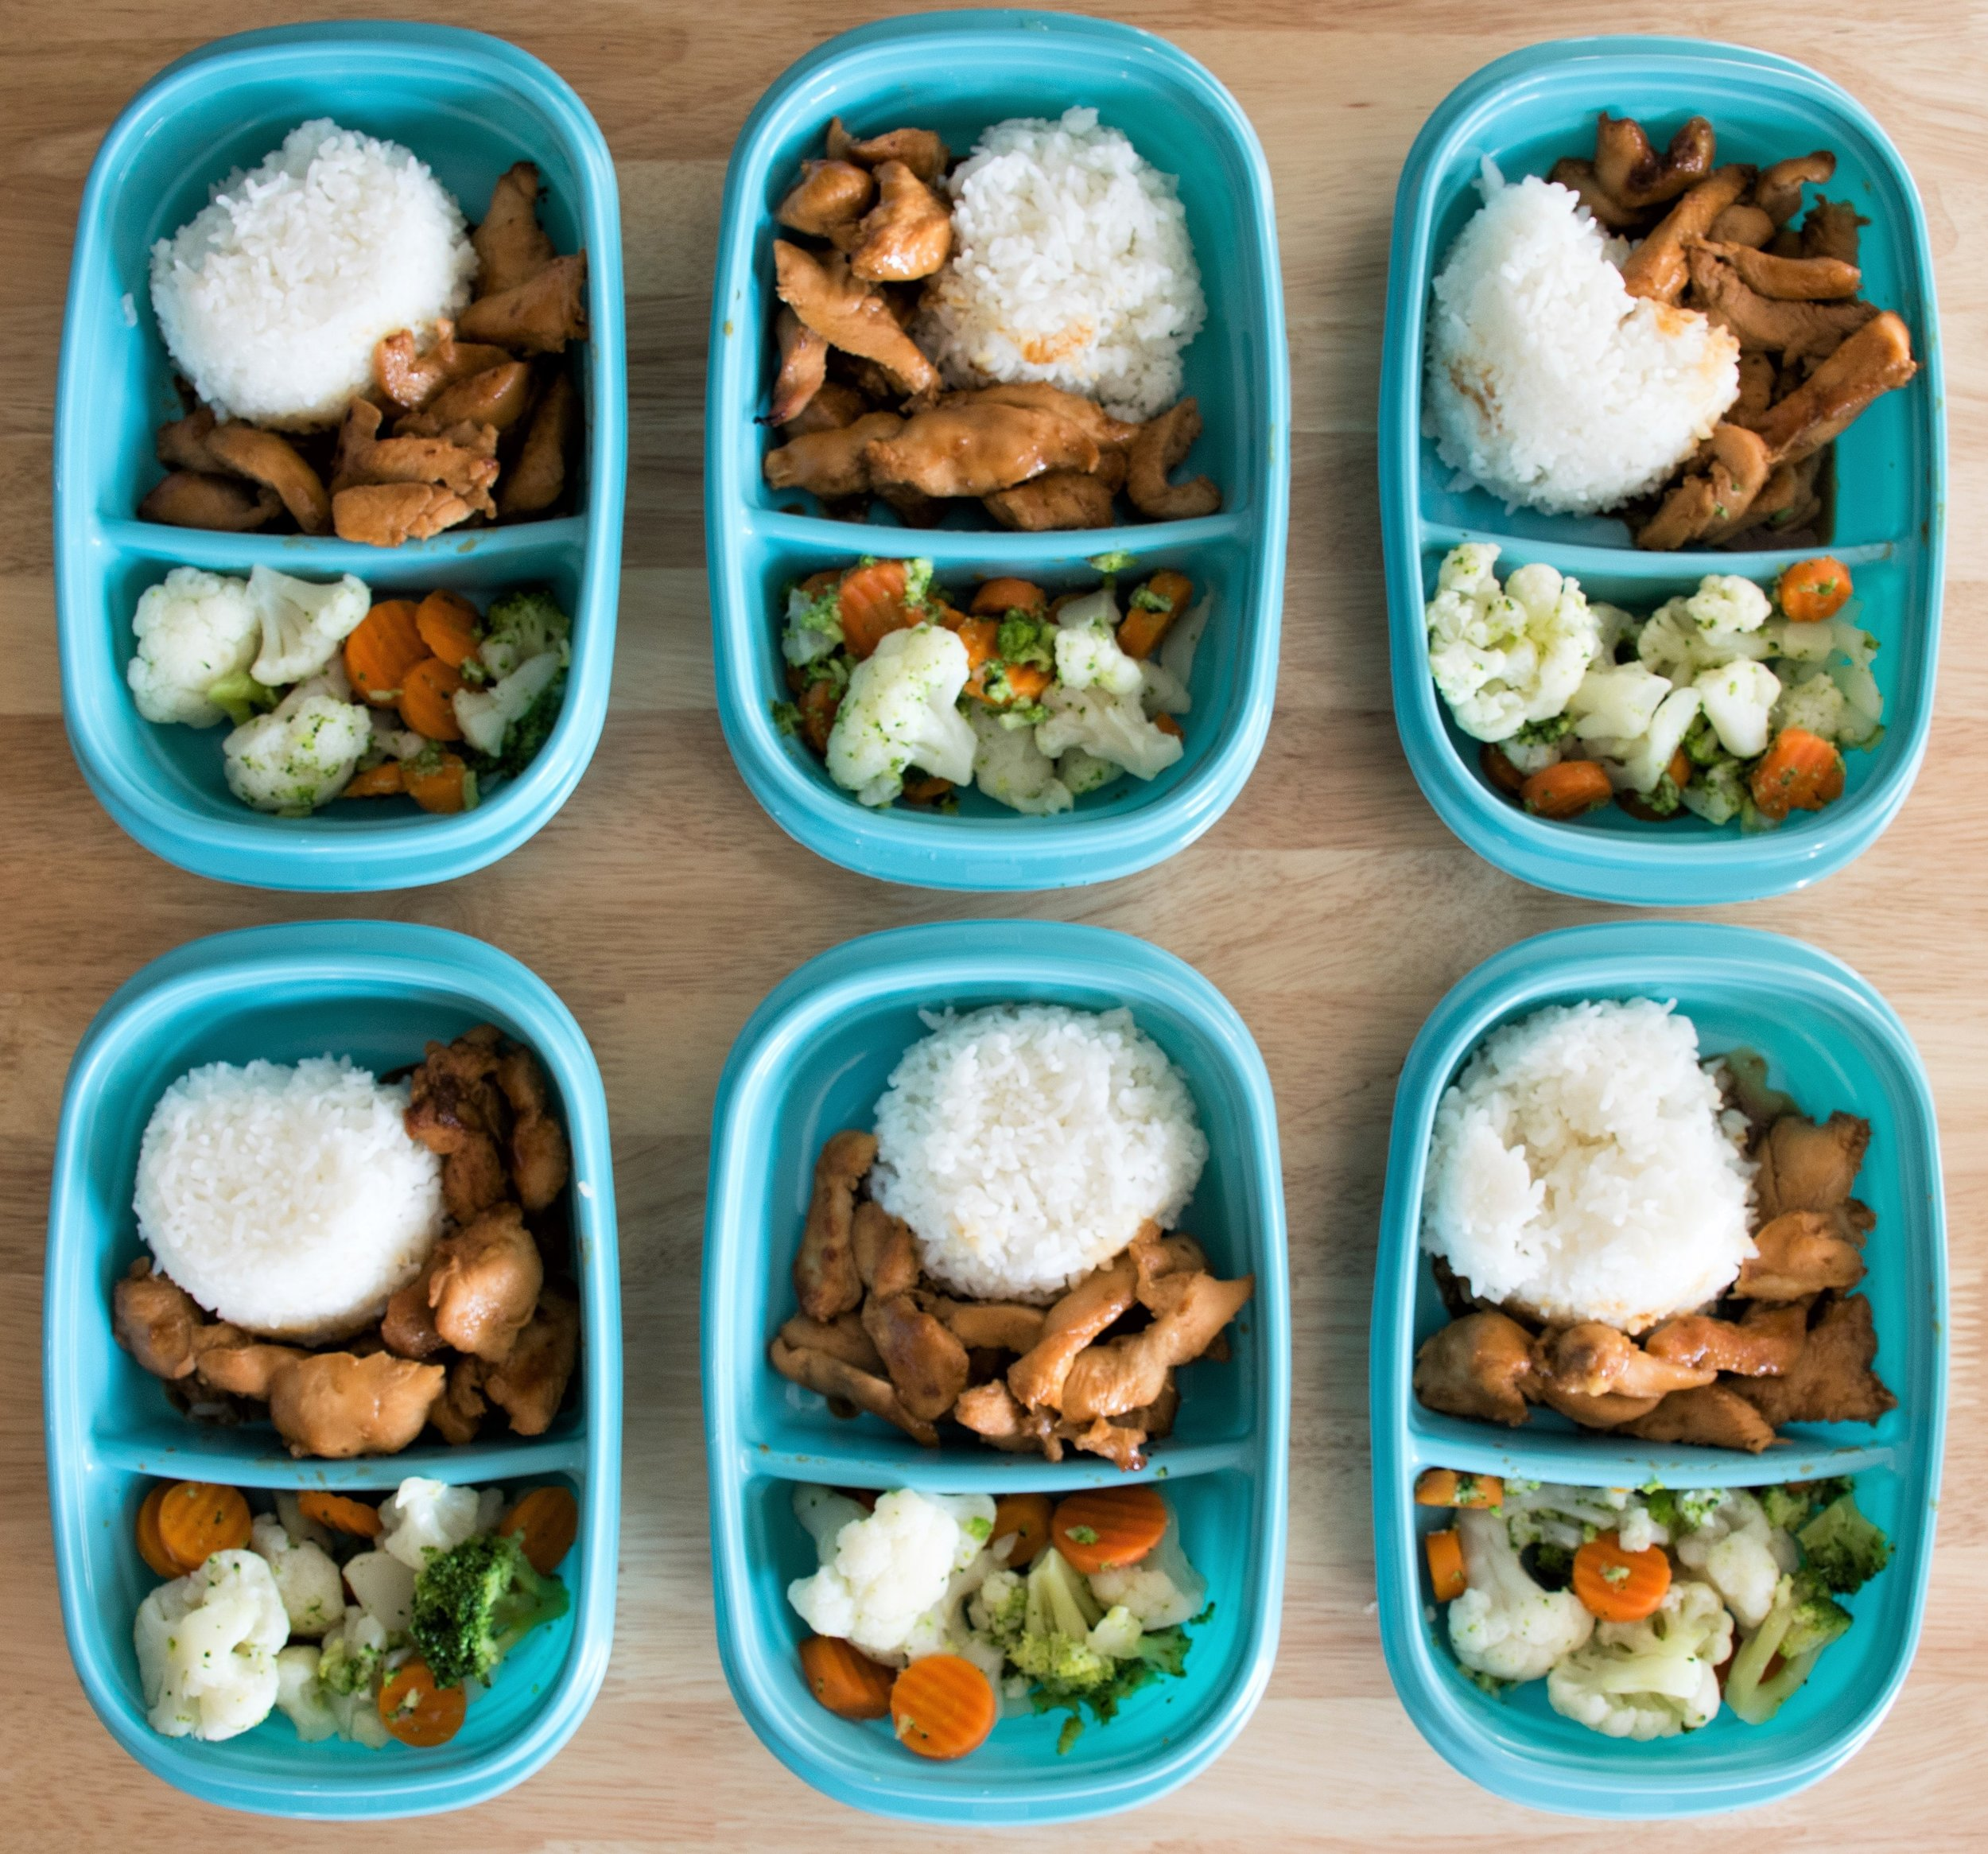 meal-prep-lunches-teriyaki-chicken-cheap-POST-INSERT-2.jpg